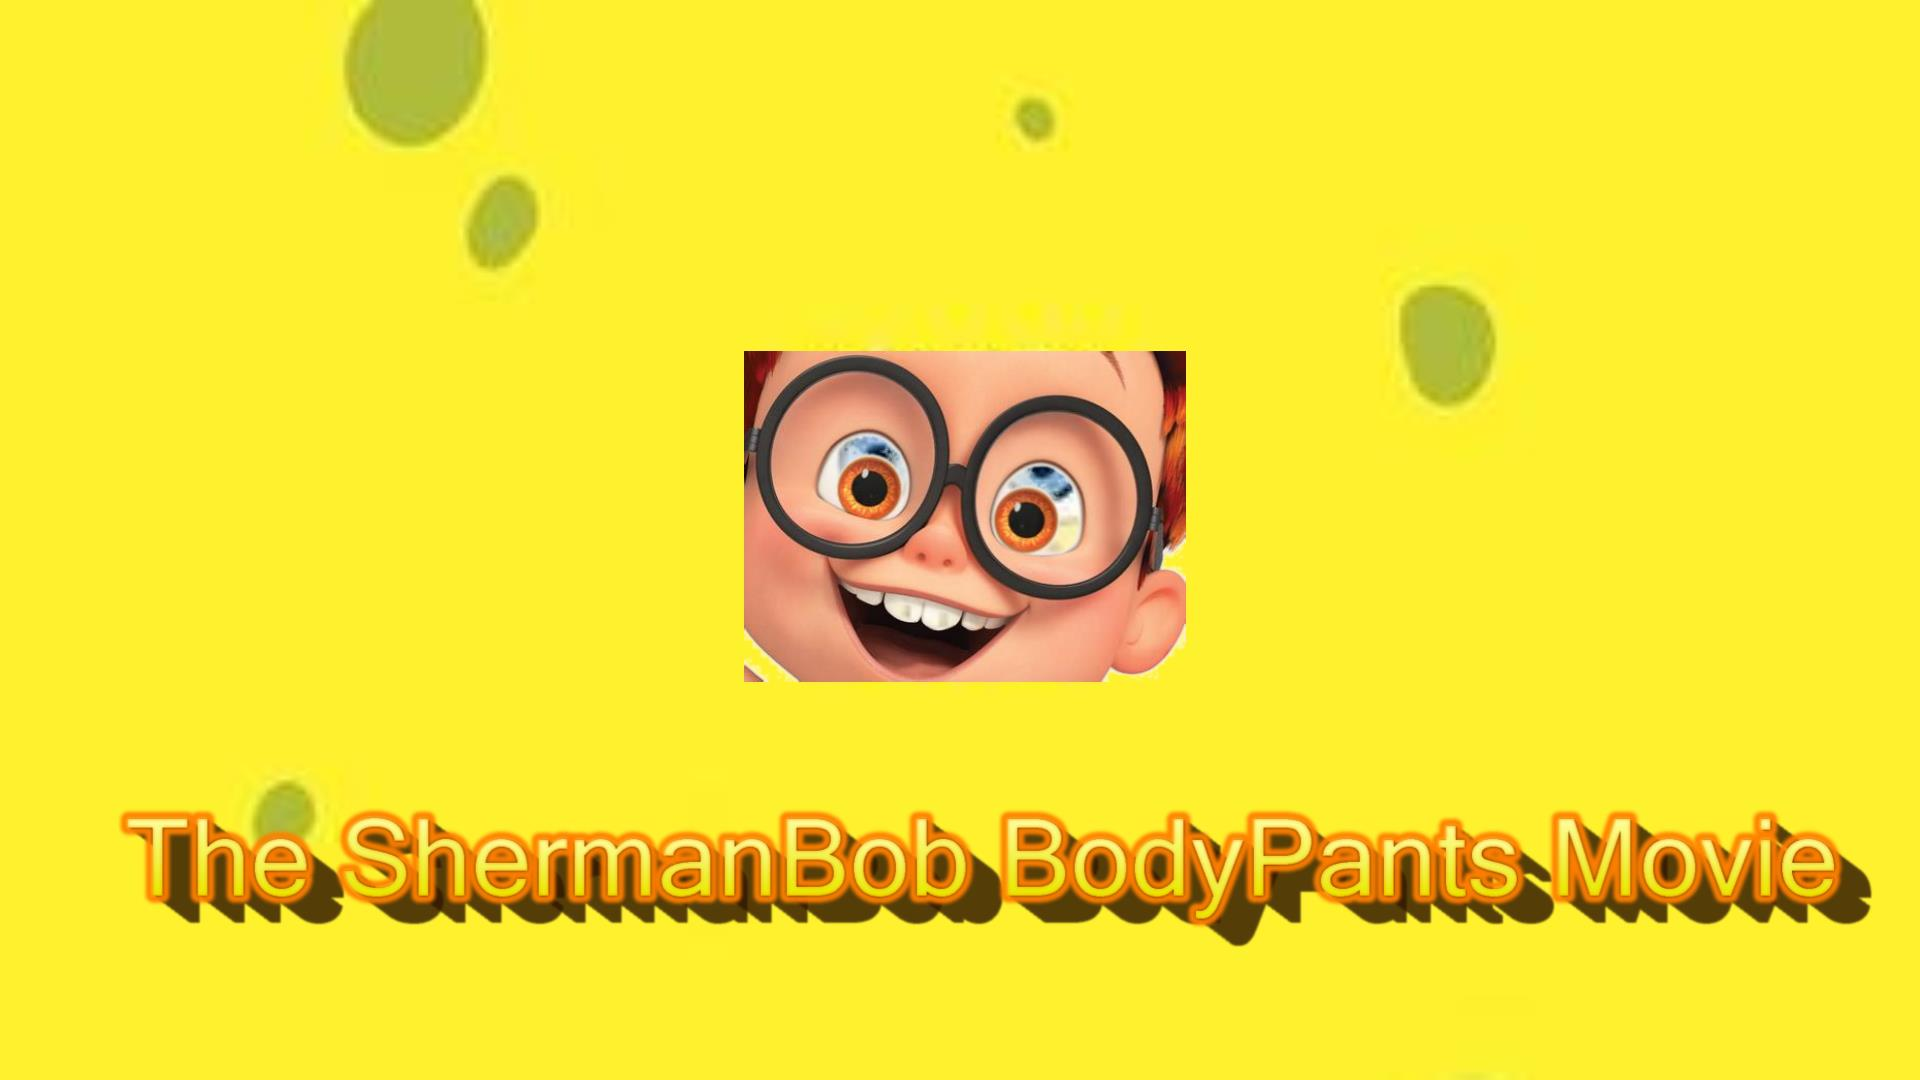 The Shermanbob BodyPants Movie